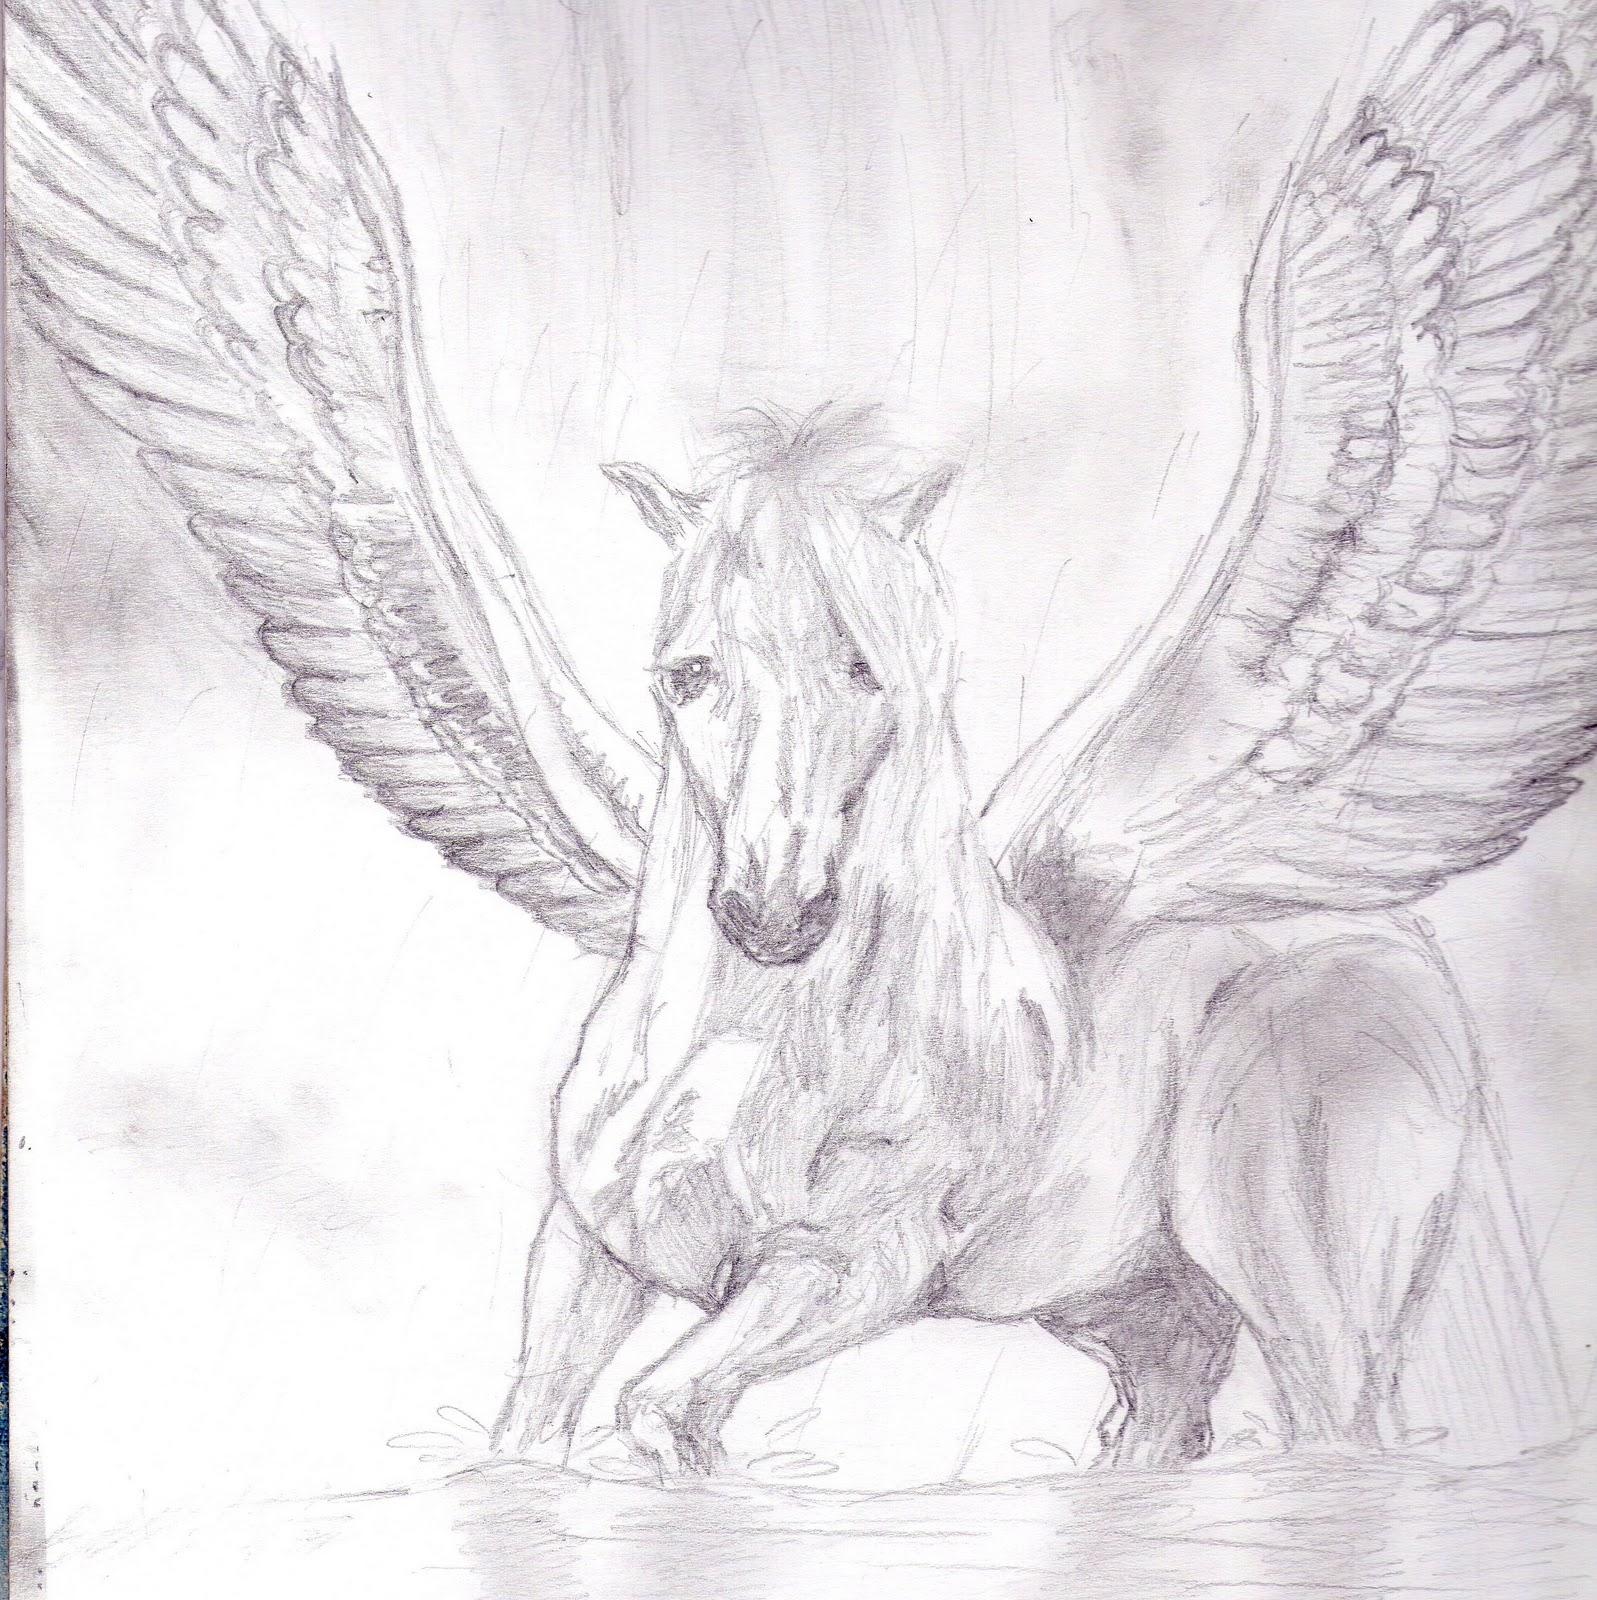 Painting Animales Fantasticos